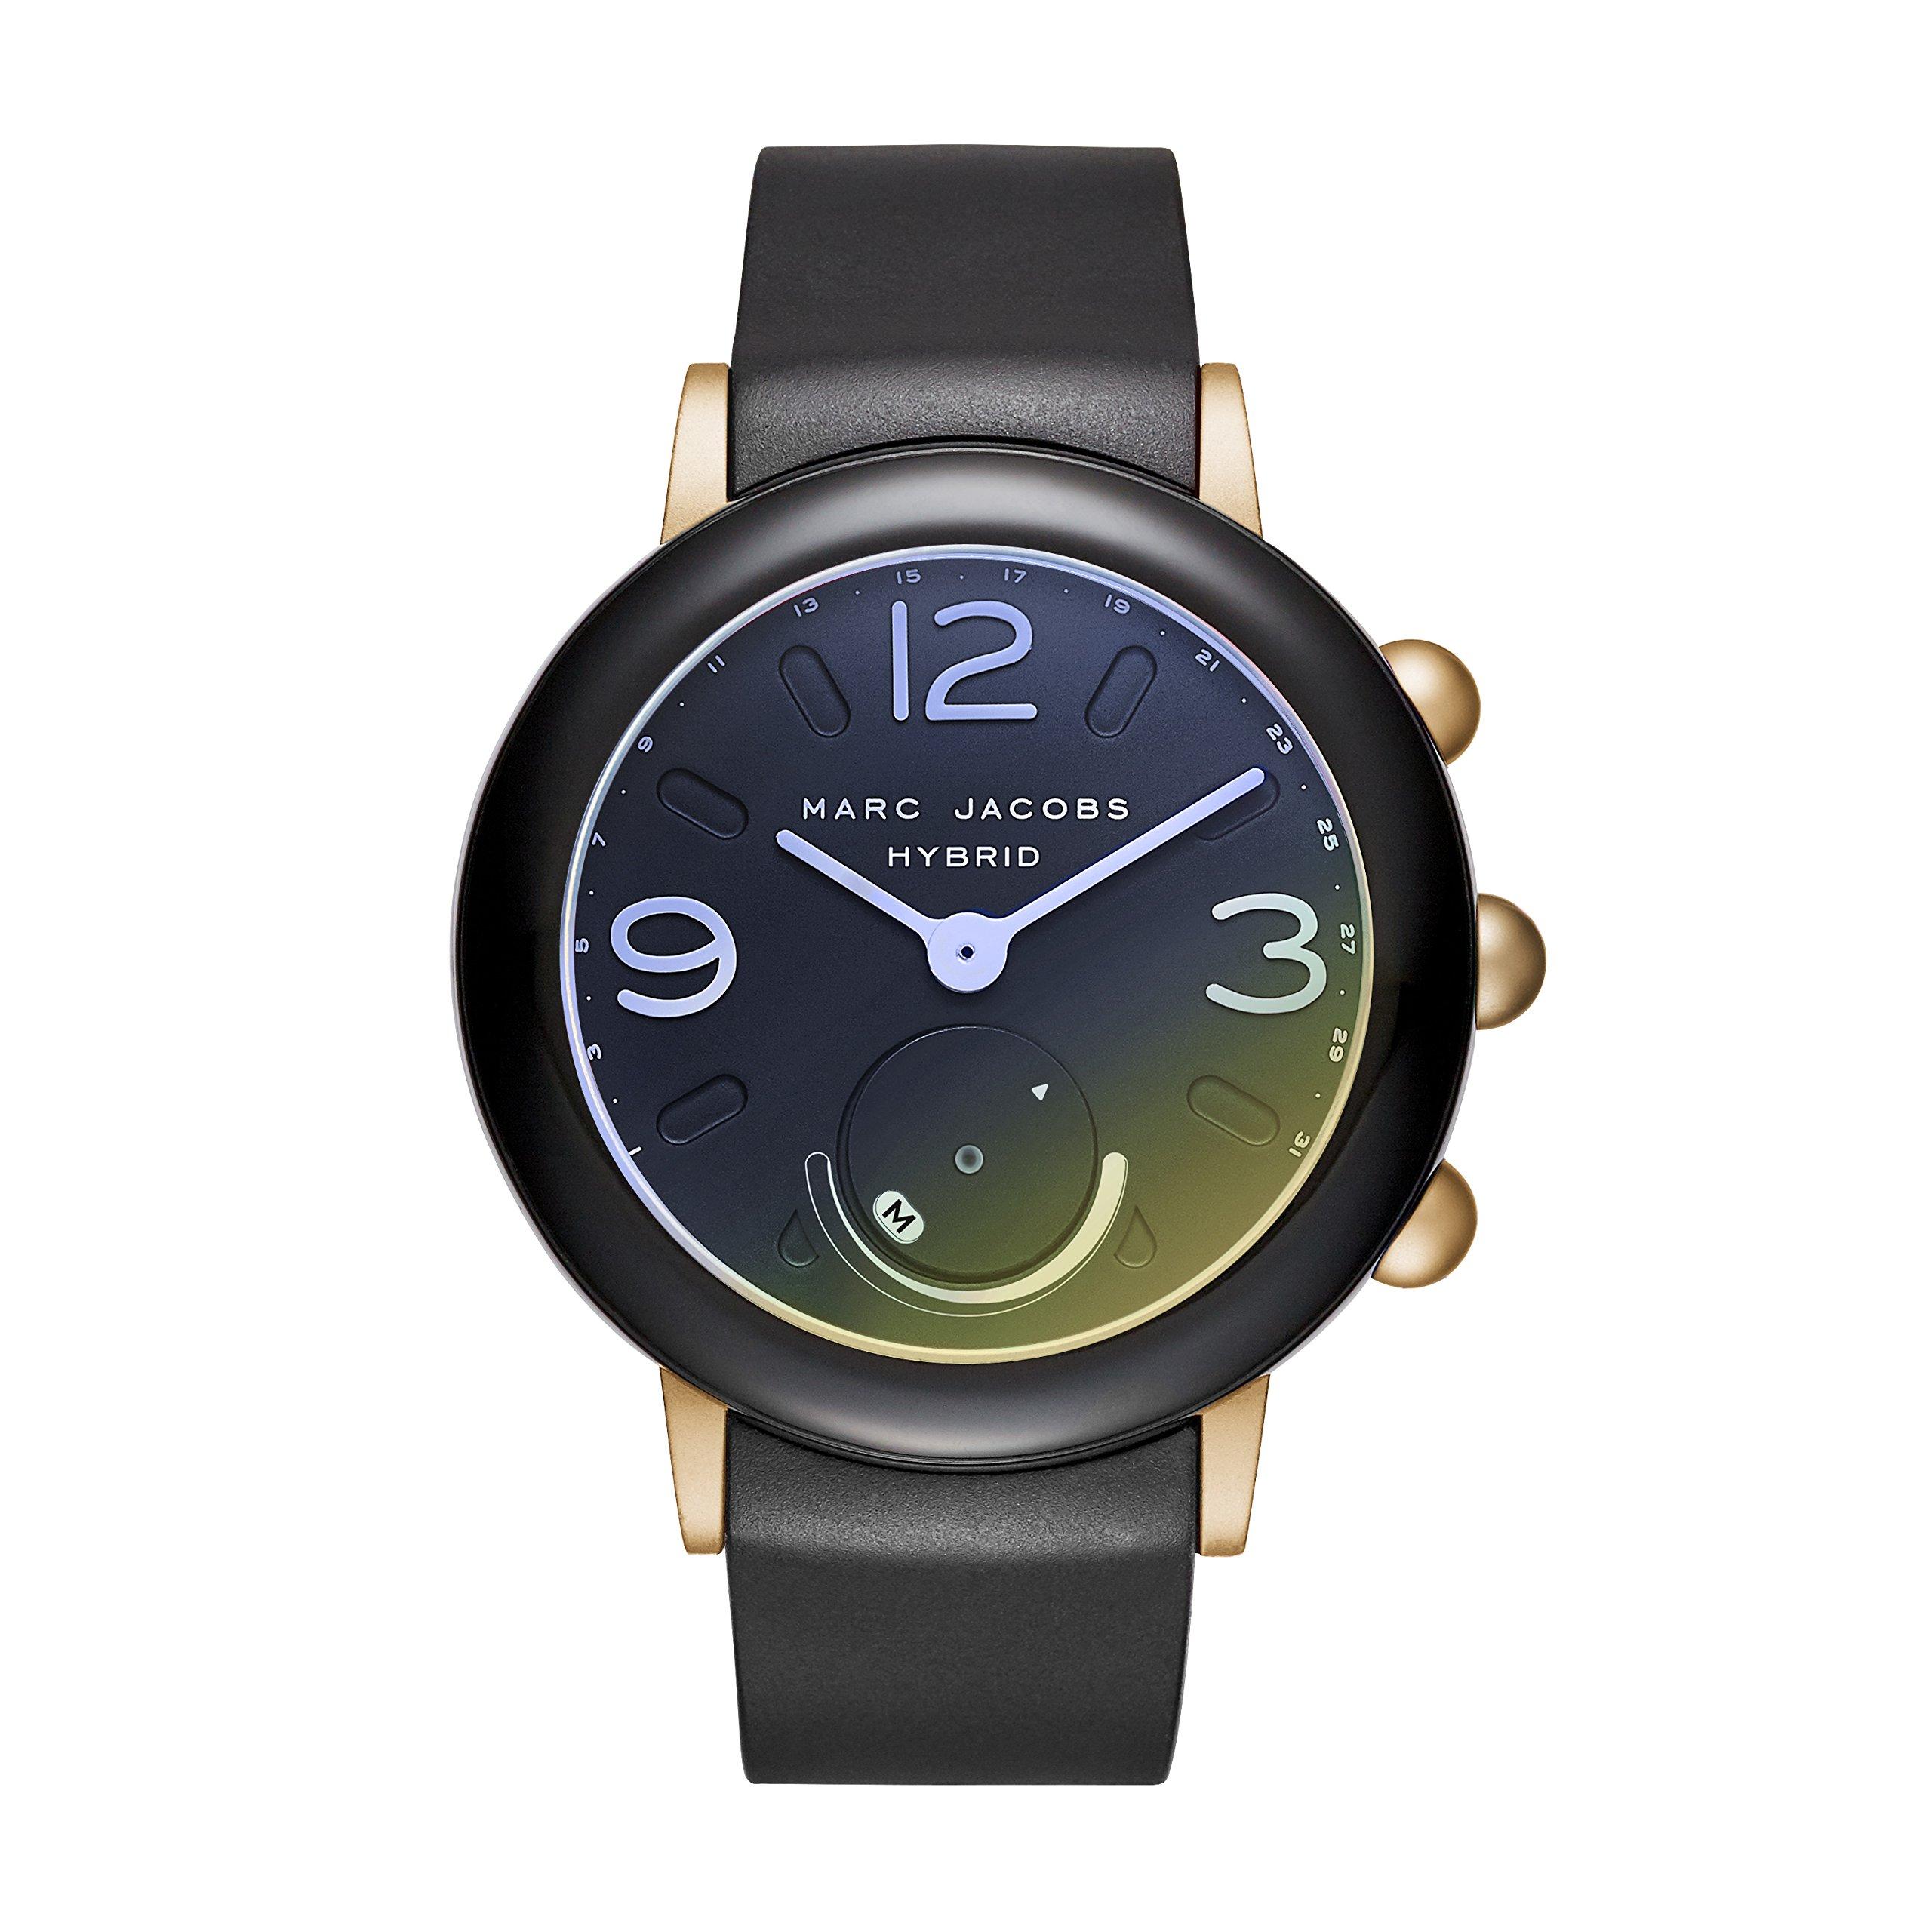 Marc Jacobs Women's Riley Aluminum and Rubber Hybrid Smartwatch, Color: Gold-Tone, Black (Model: MJT1001)